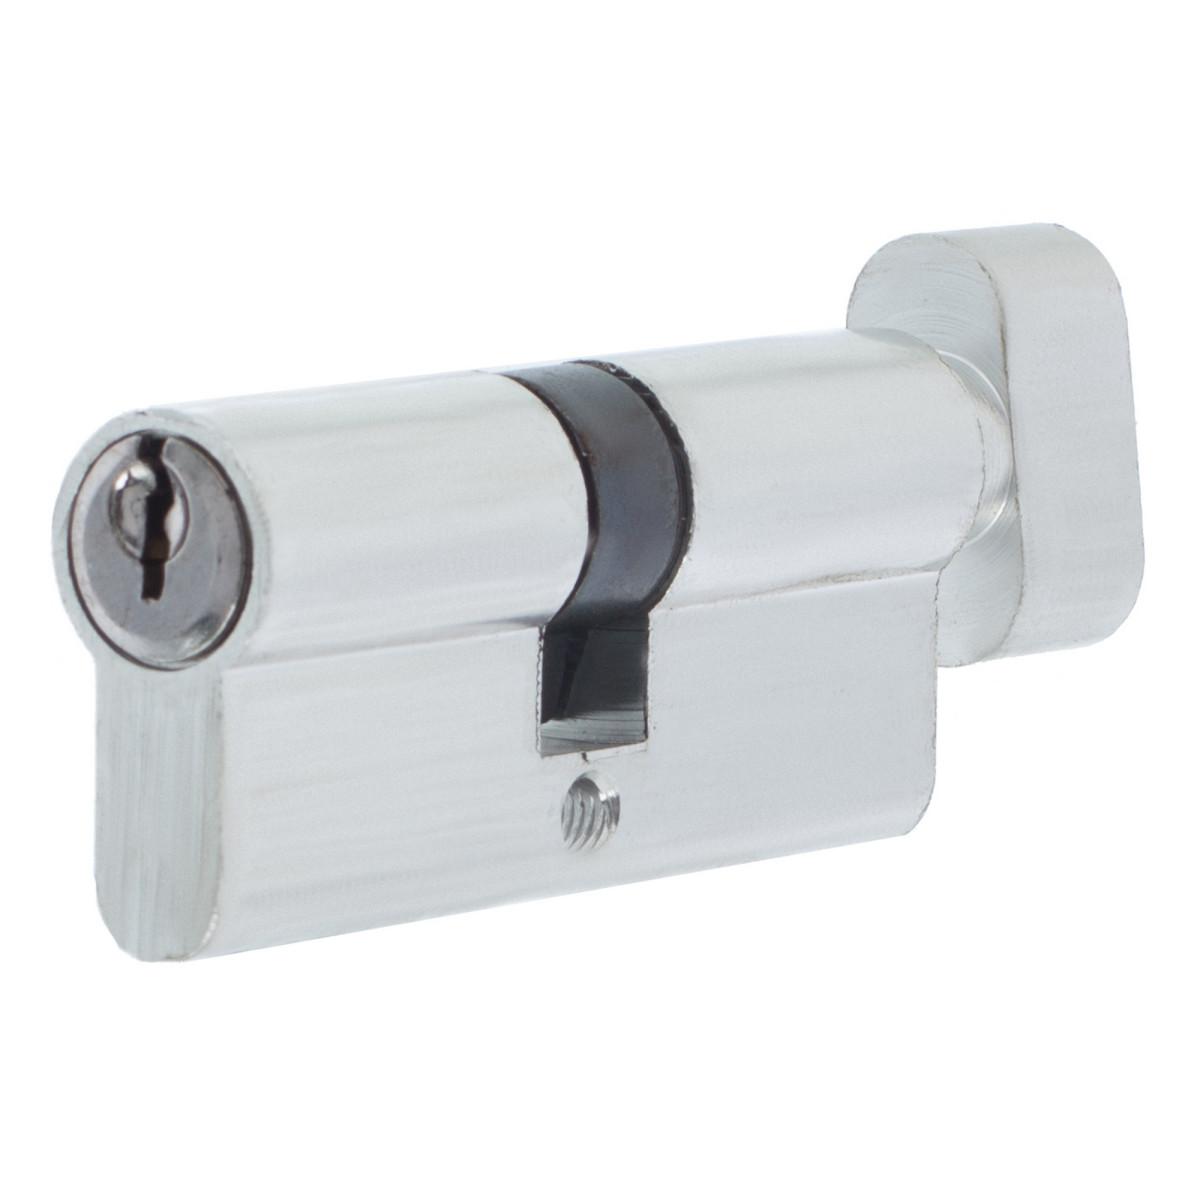 Цилиндр Palladium E AL 70 35x35 мм ключ/ключ цвет золото